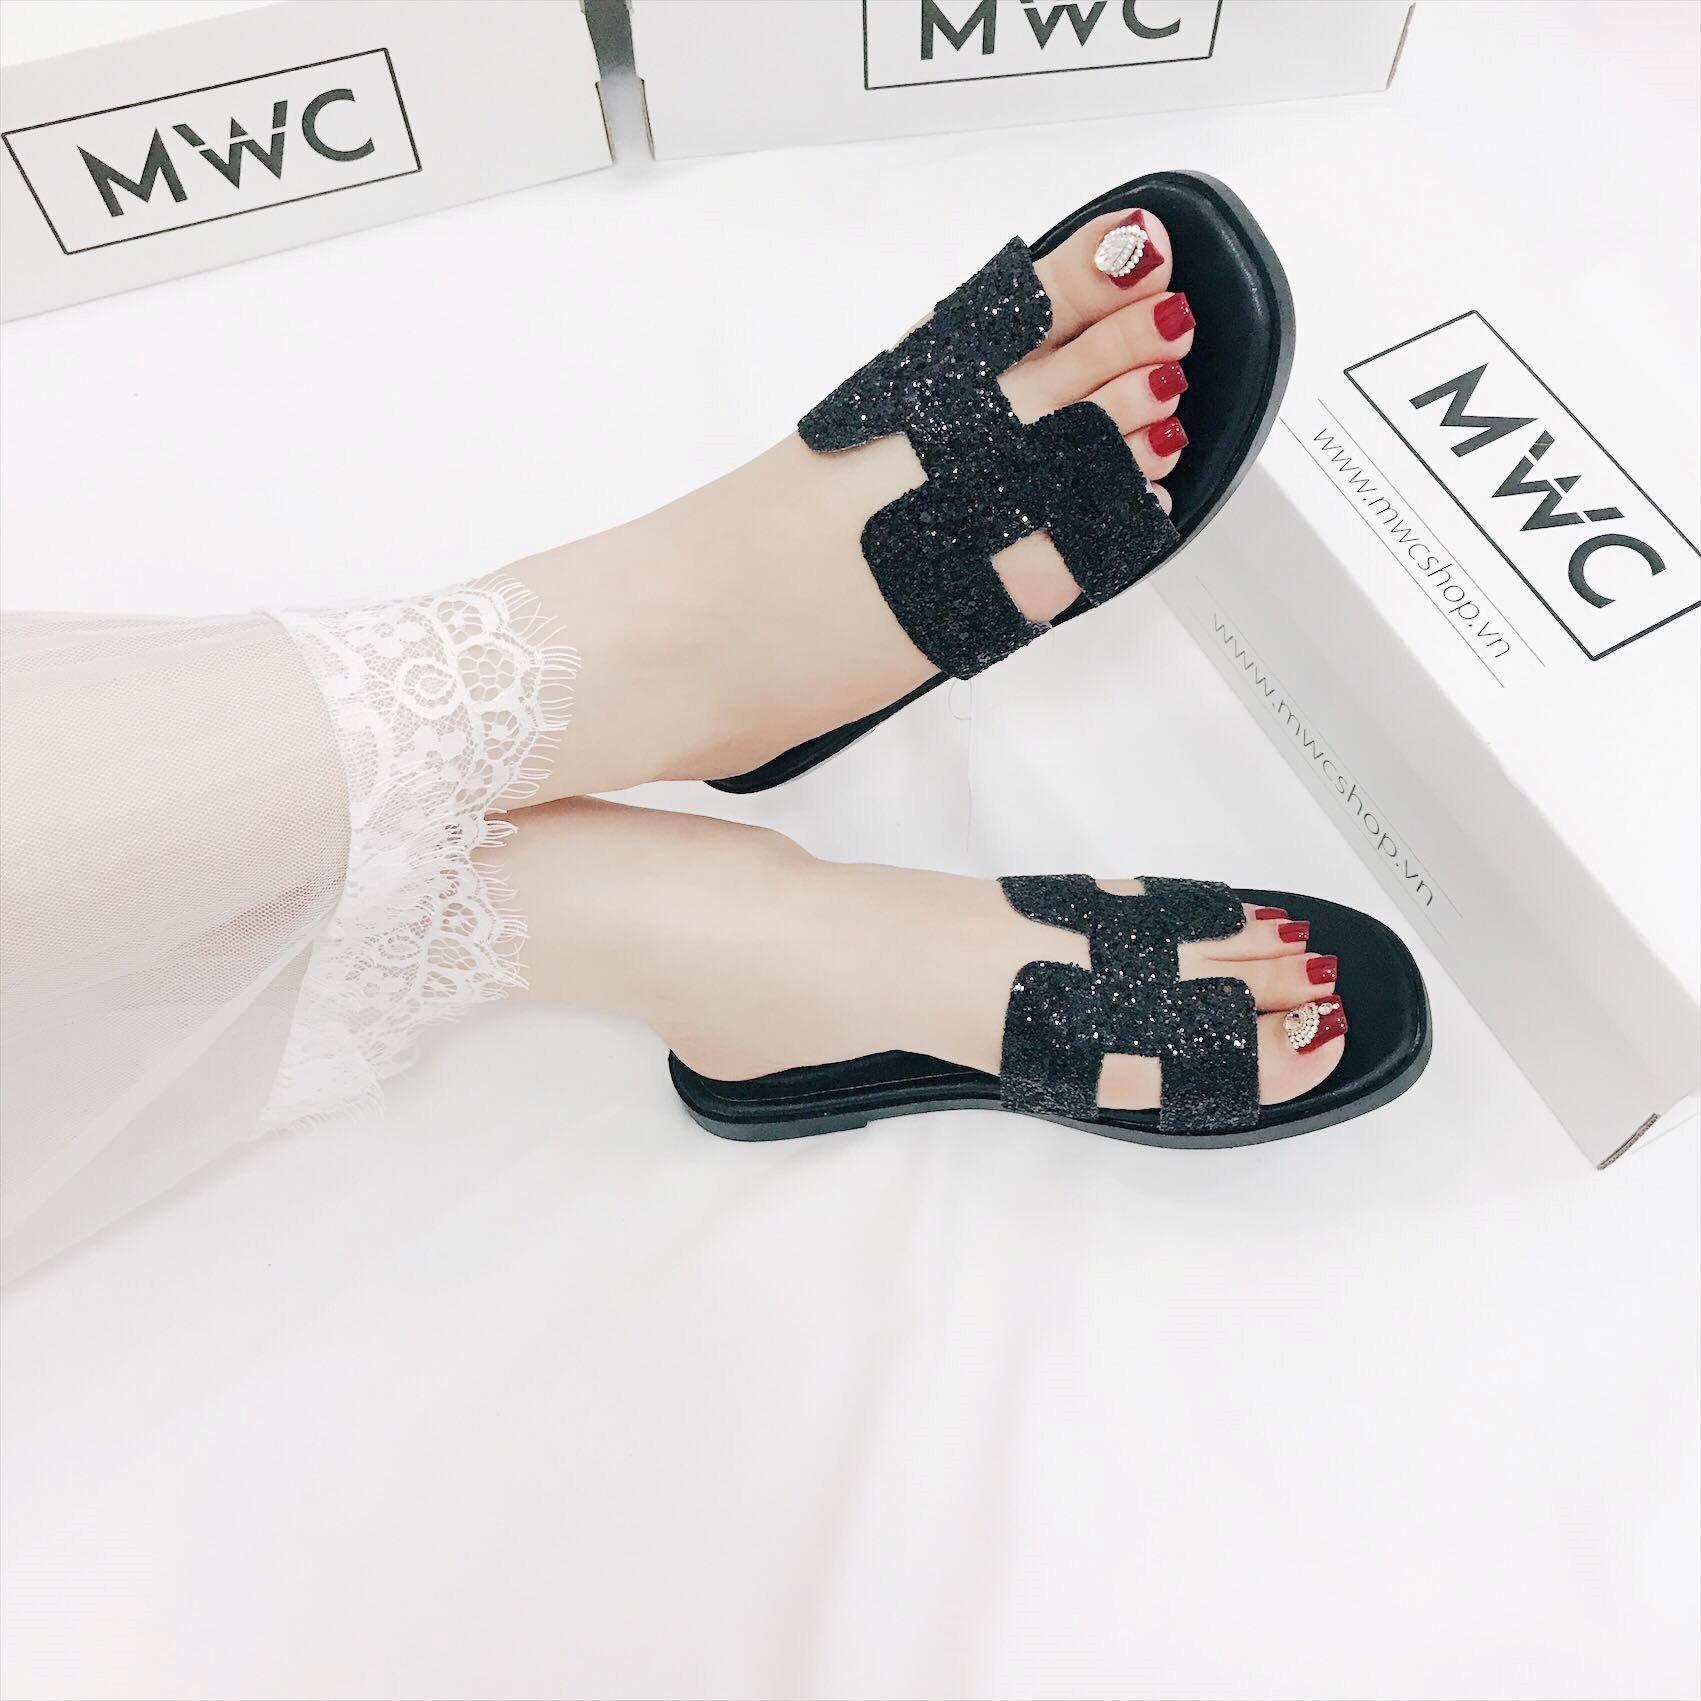 Dép nữ MWC NUDE- 3028